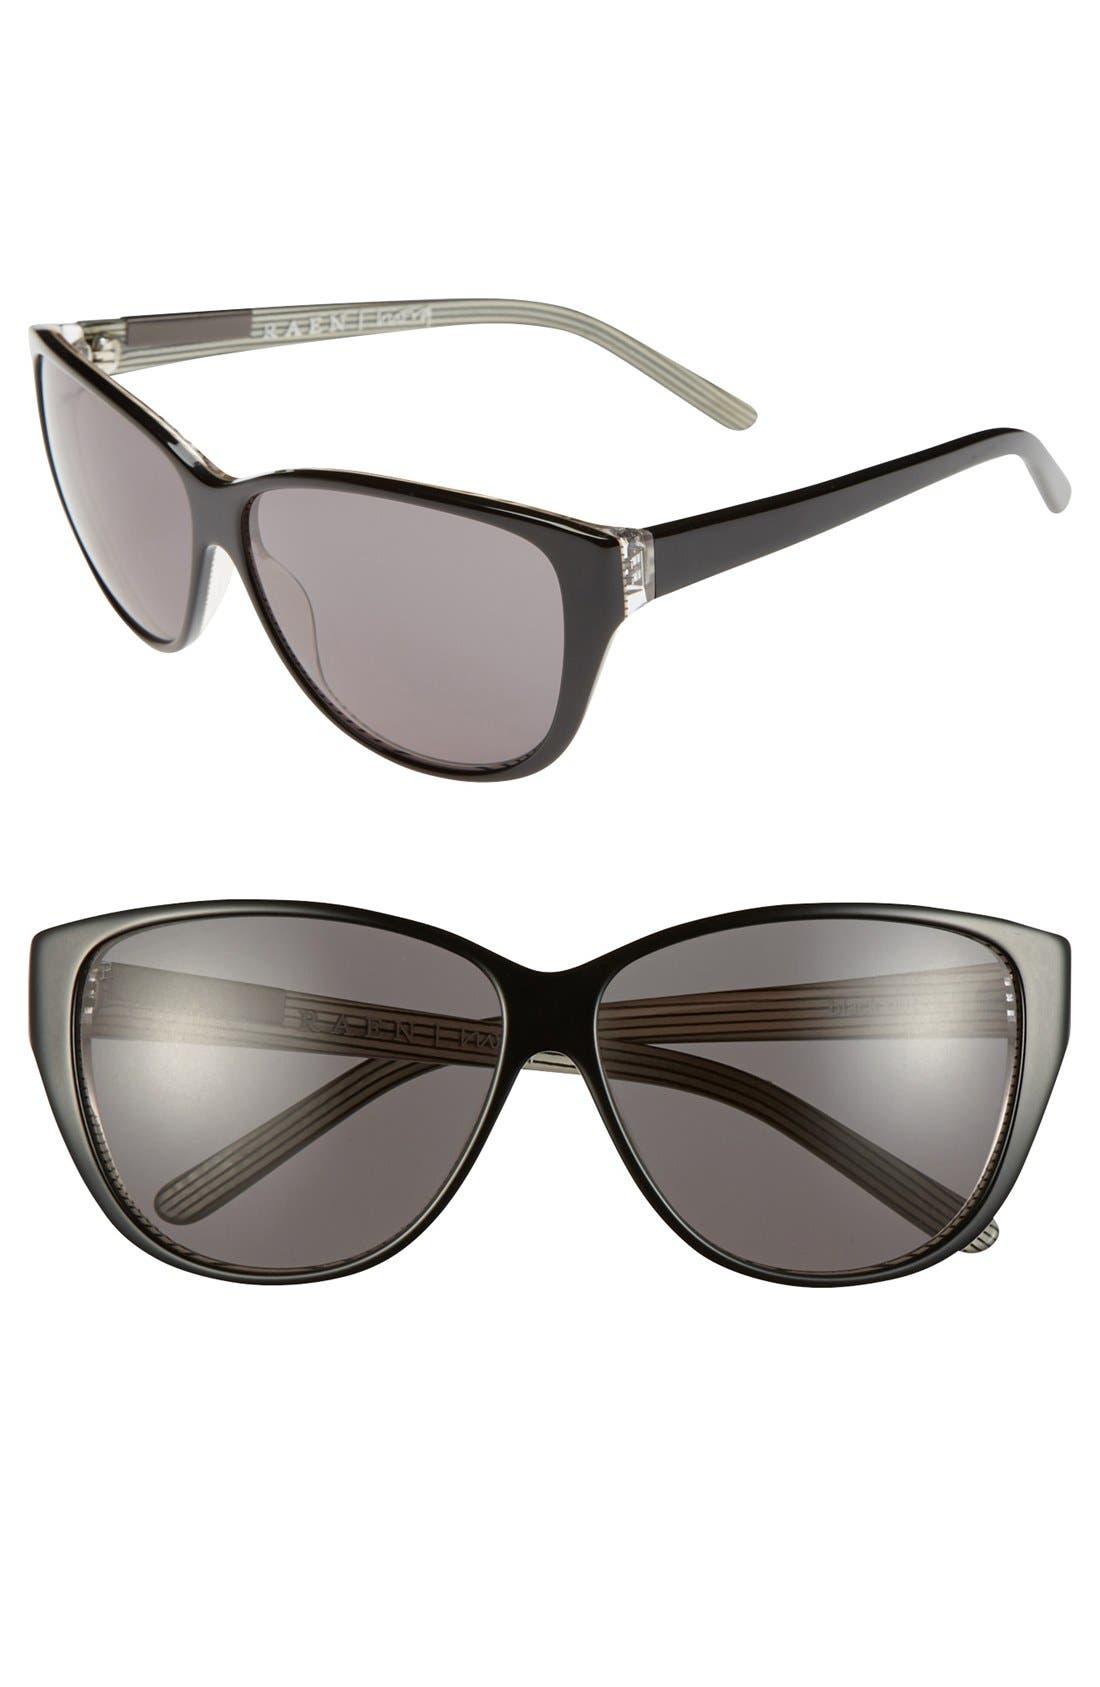 Main Image - RAEN 'Nora' 59mm Sunglasses